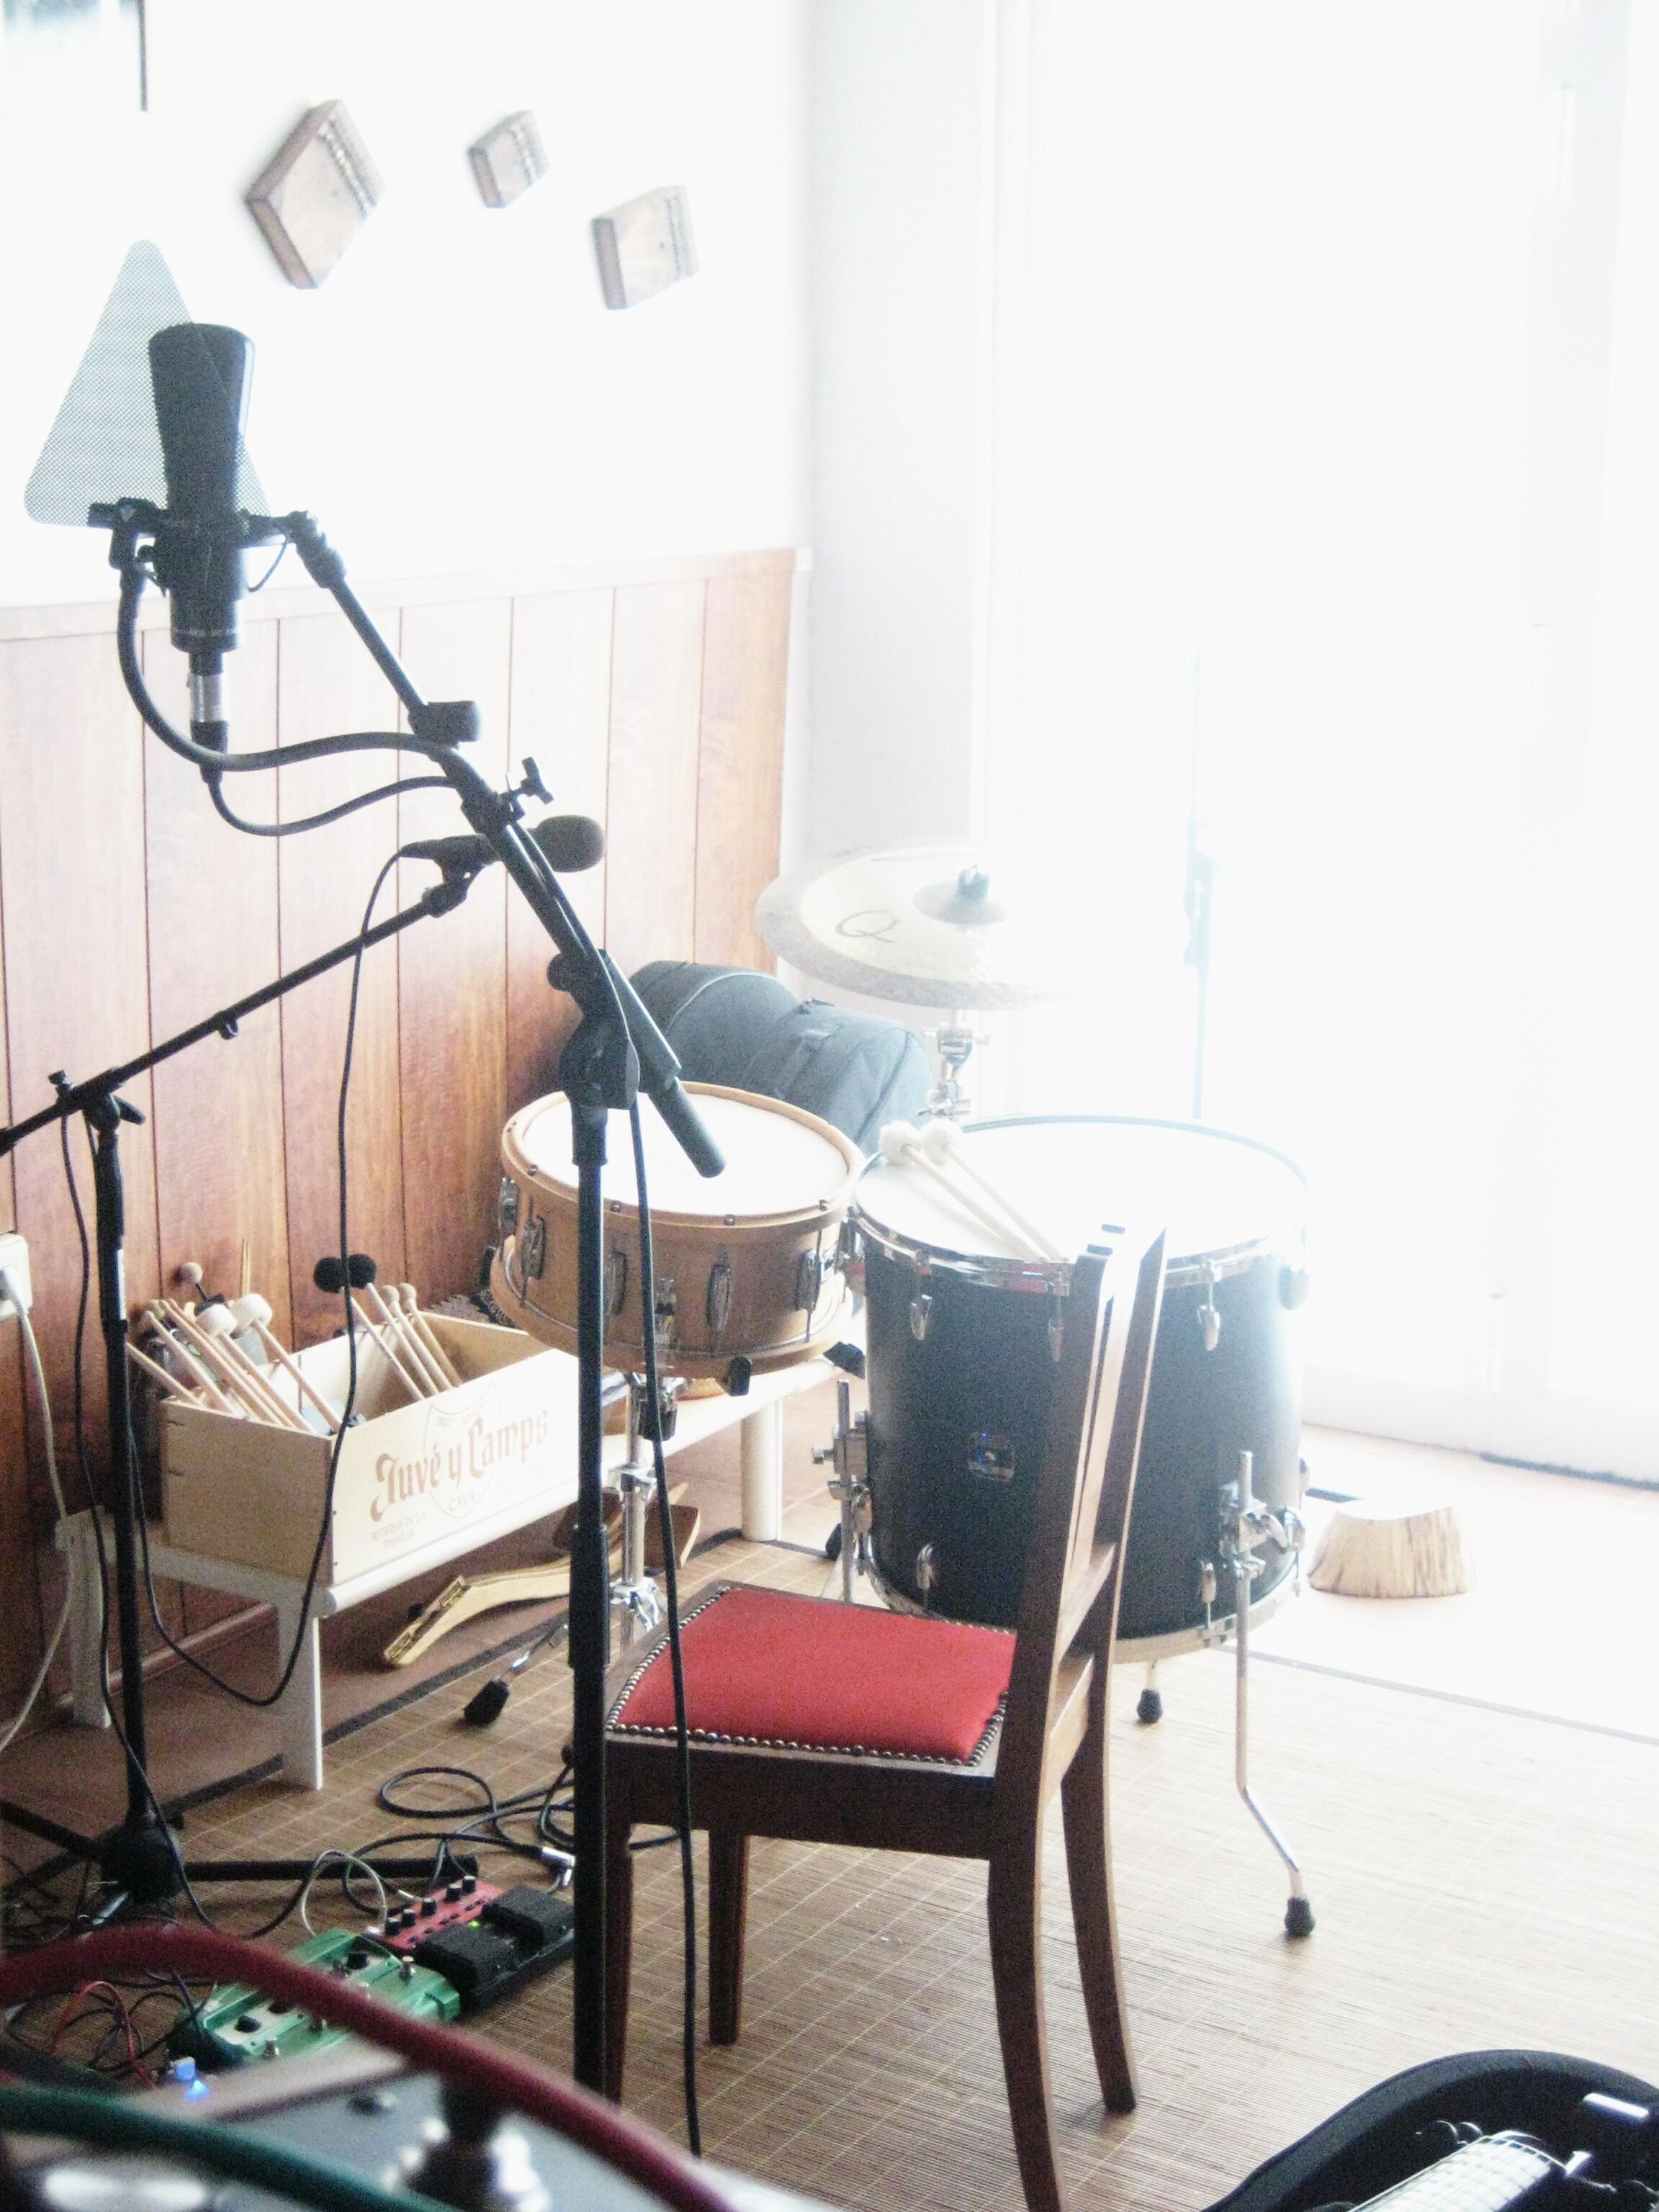 My Studio Colleen Live Recording Setup 2010 02 Im Kin Vocals And Floor Tom S